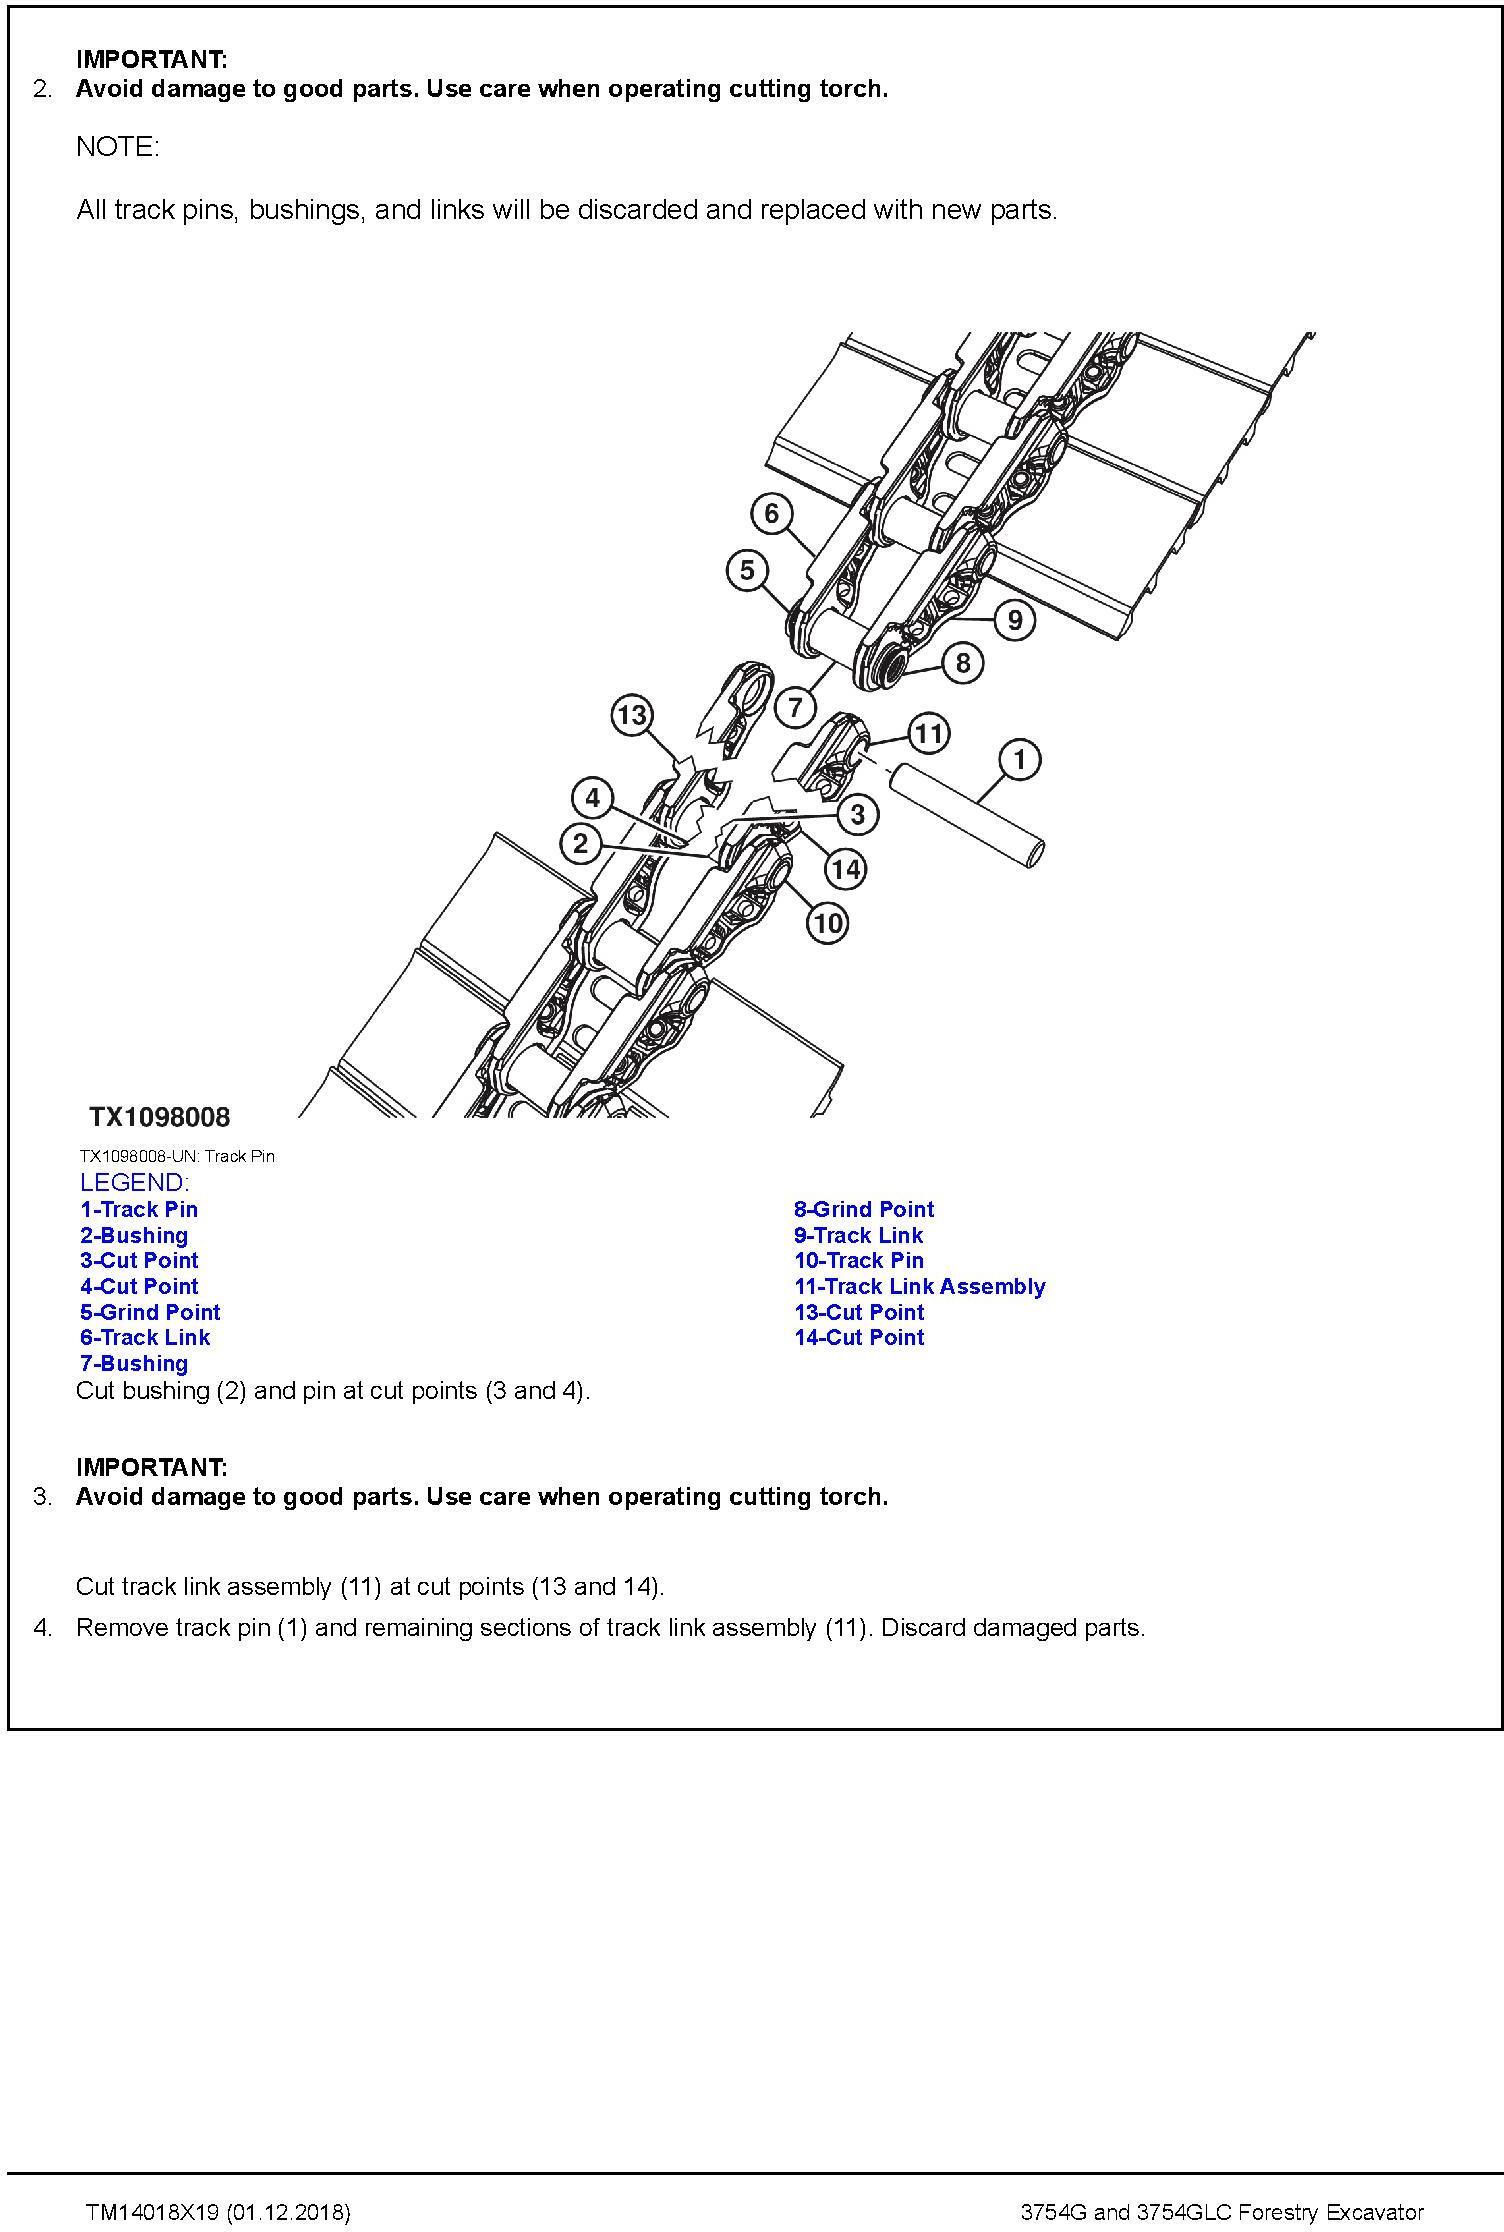 John Deere 3754G, 3754GLC (SN .D371001-) Forestry Excavator Repair Technical Manual (TM14018X19) - 1